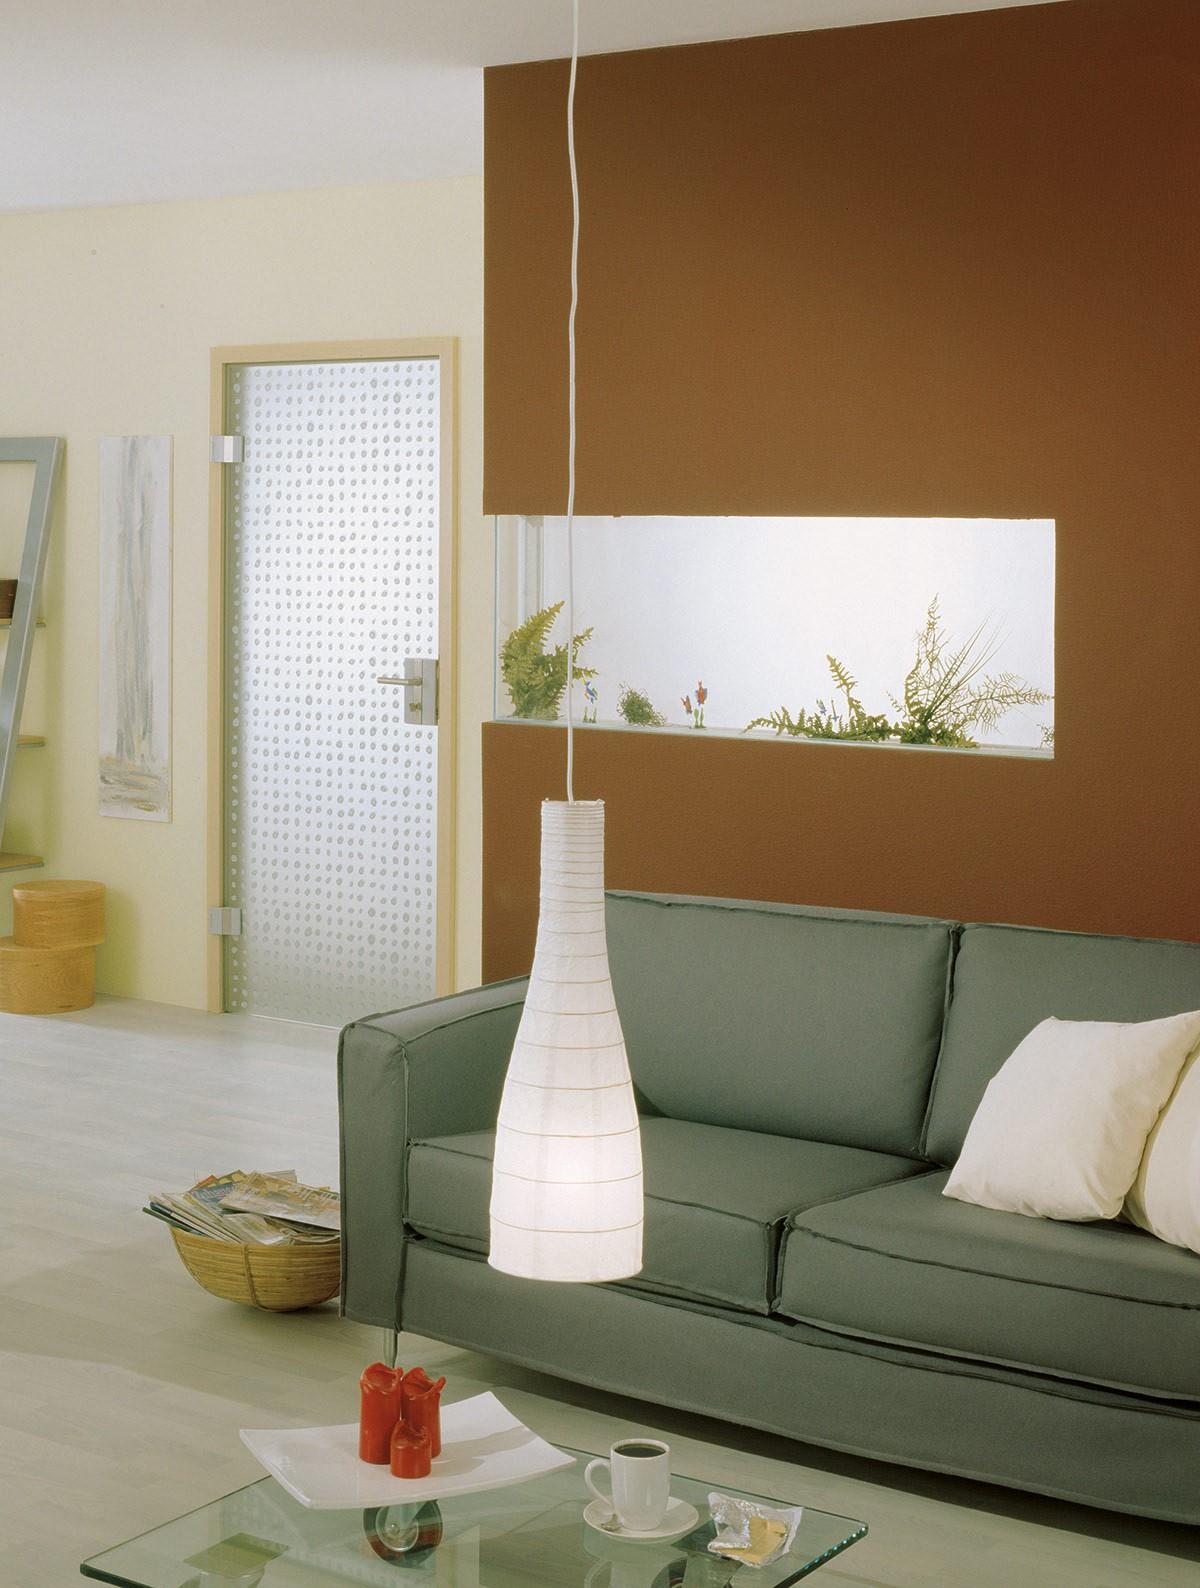 6 rollen erfurt rauhfaser classico tapete 25x0 53m. Black Bedroom Furniture Sets. Home Design Ideas